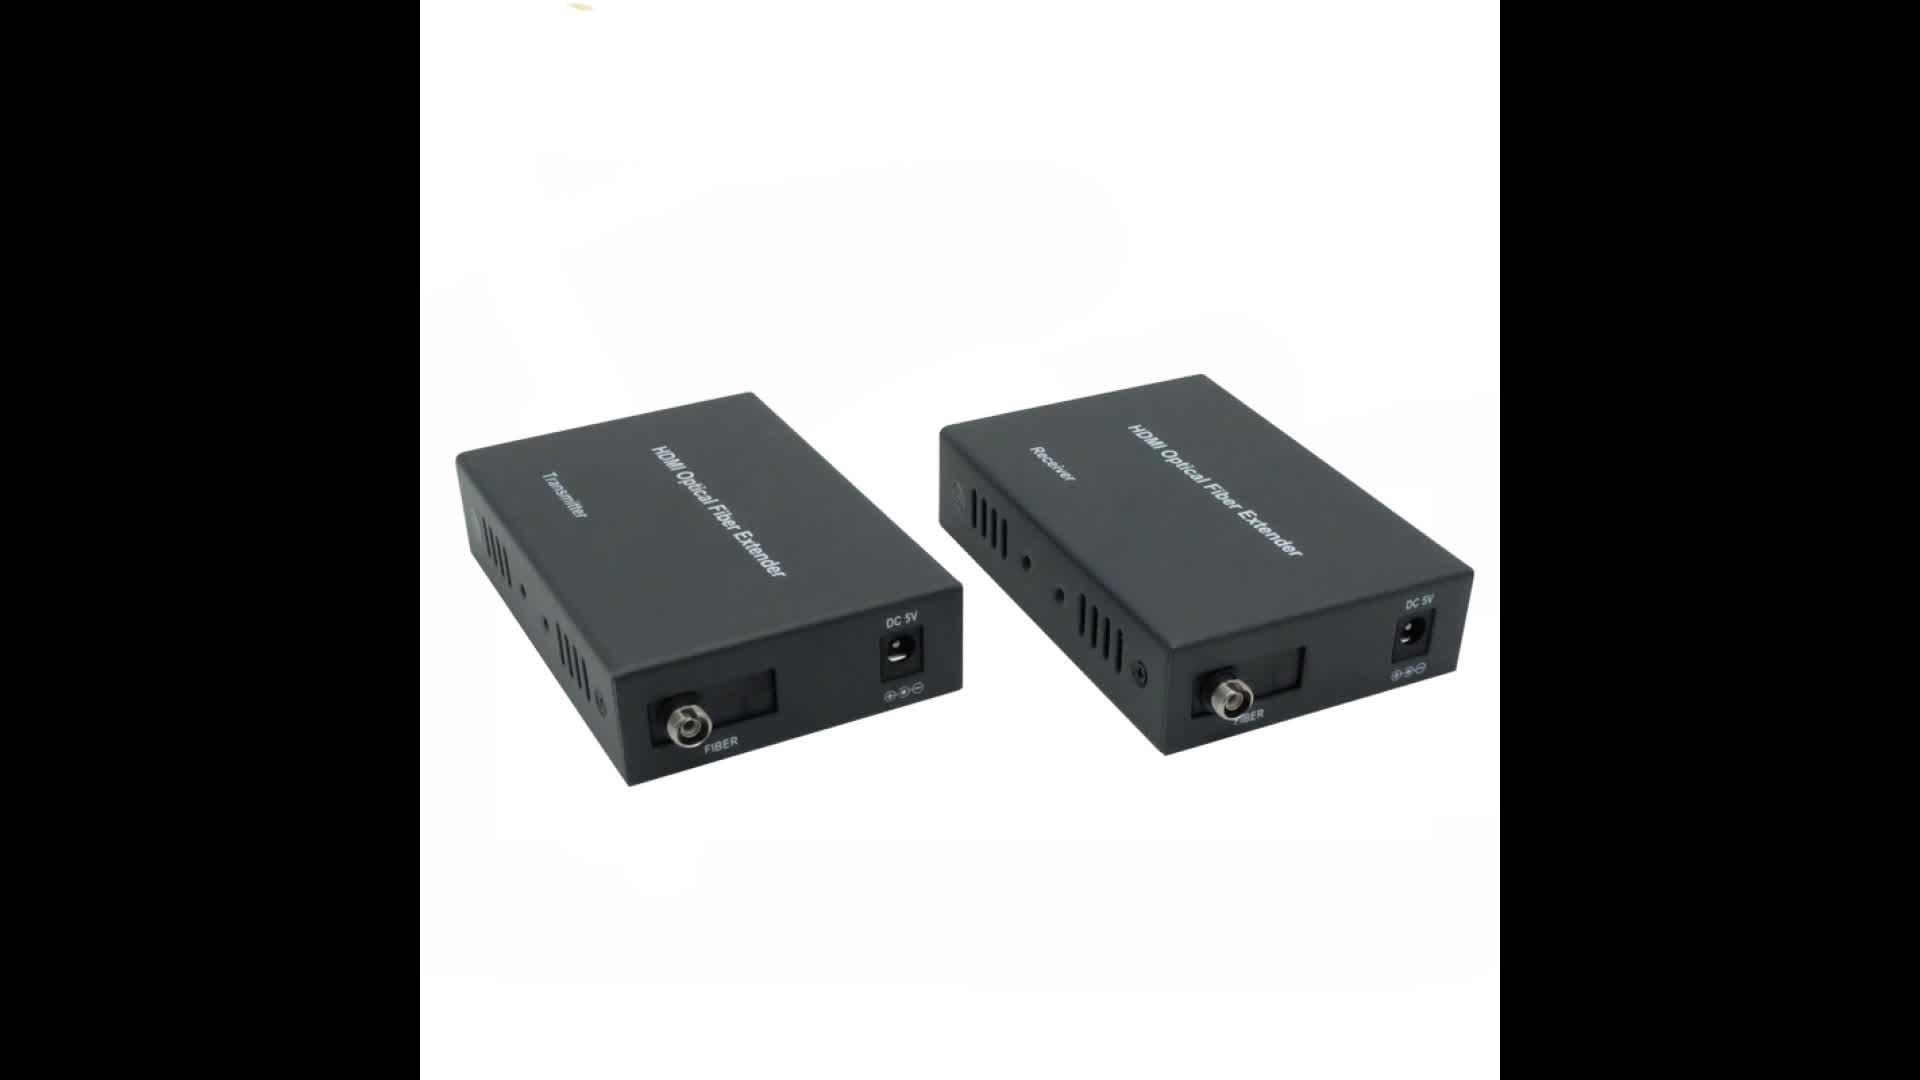 PWAY  Transmitter 1080P@60Hz DT103F  Fiber Optic Extender 20KM